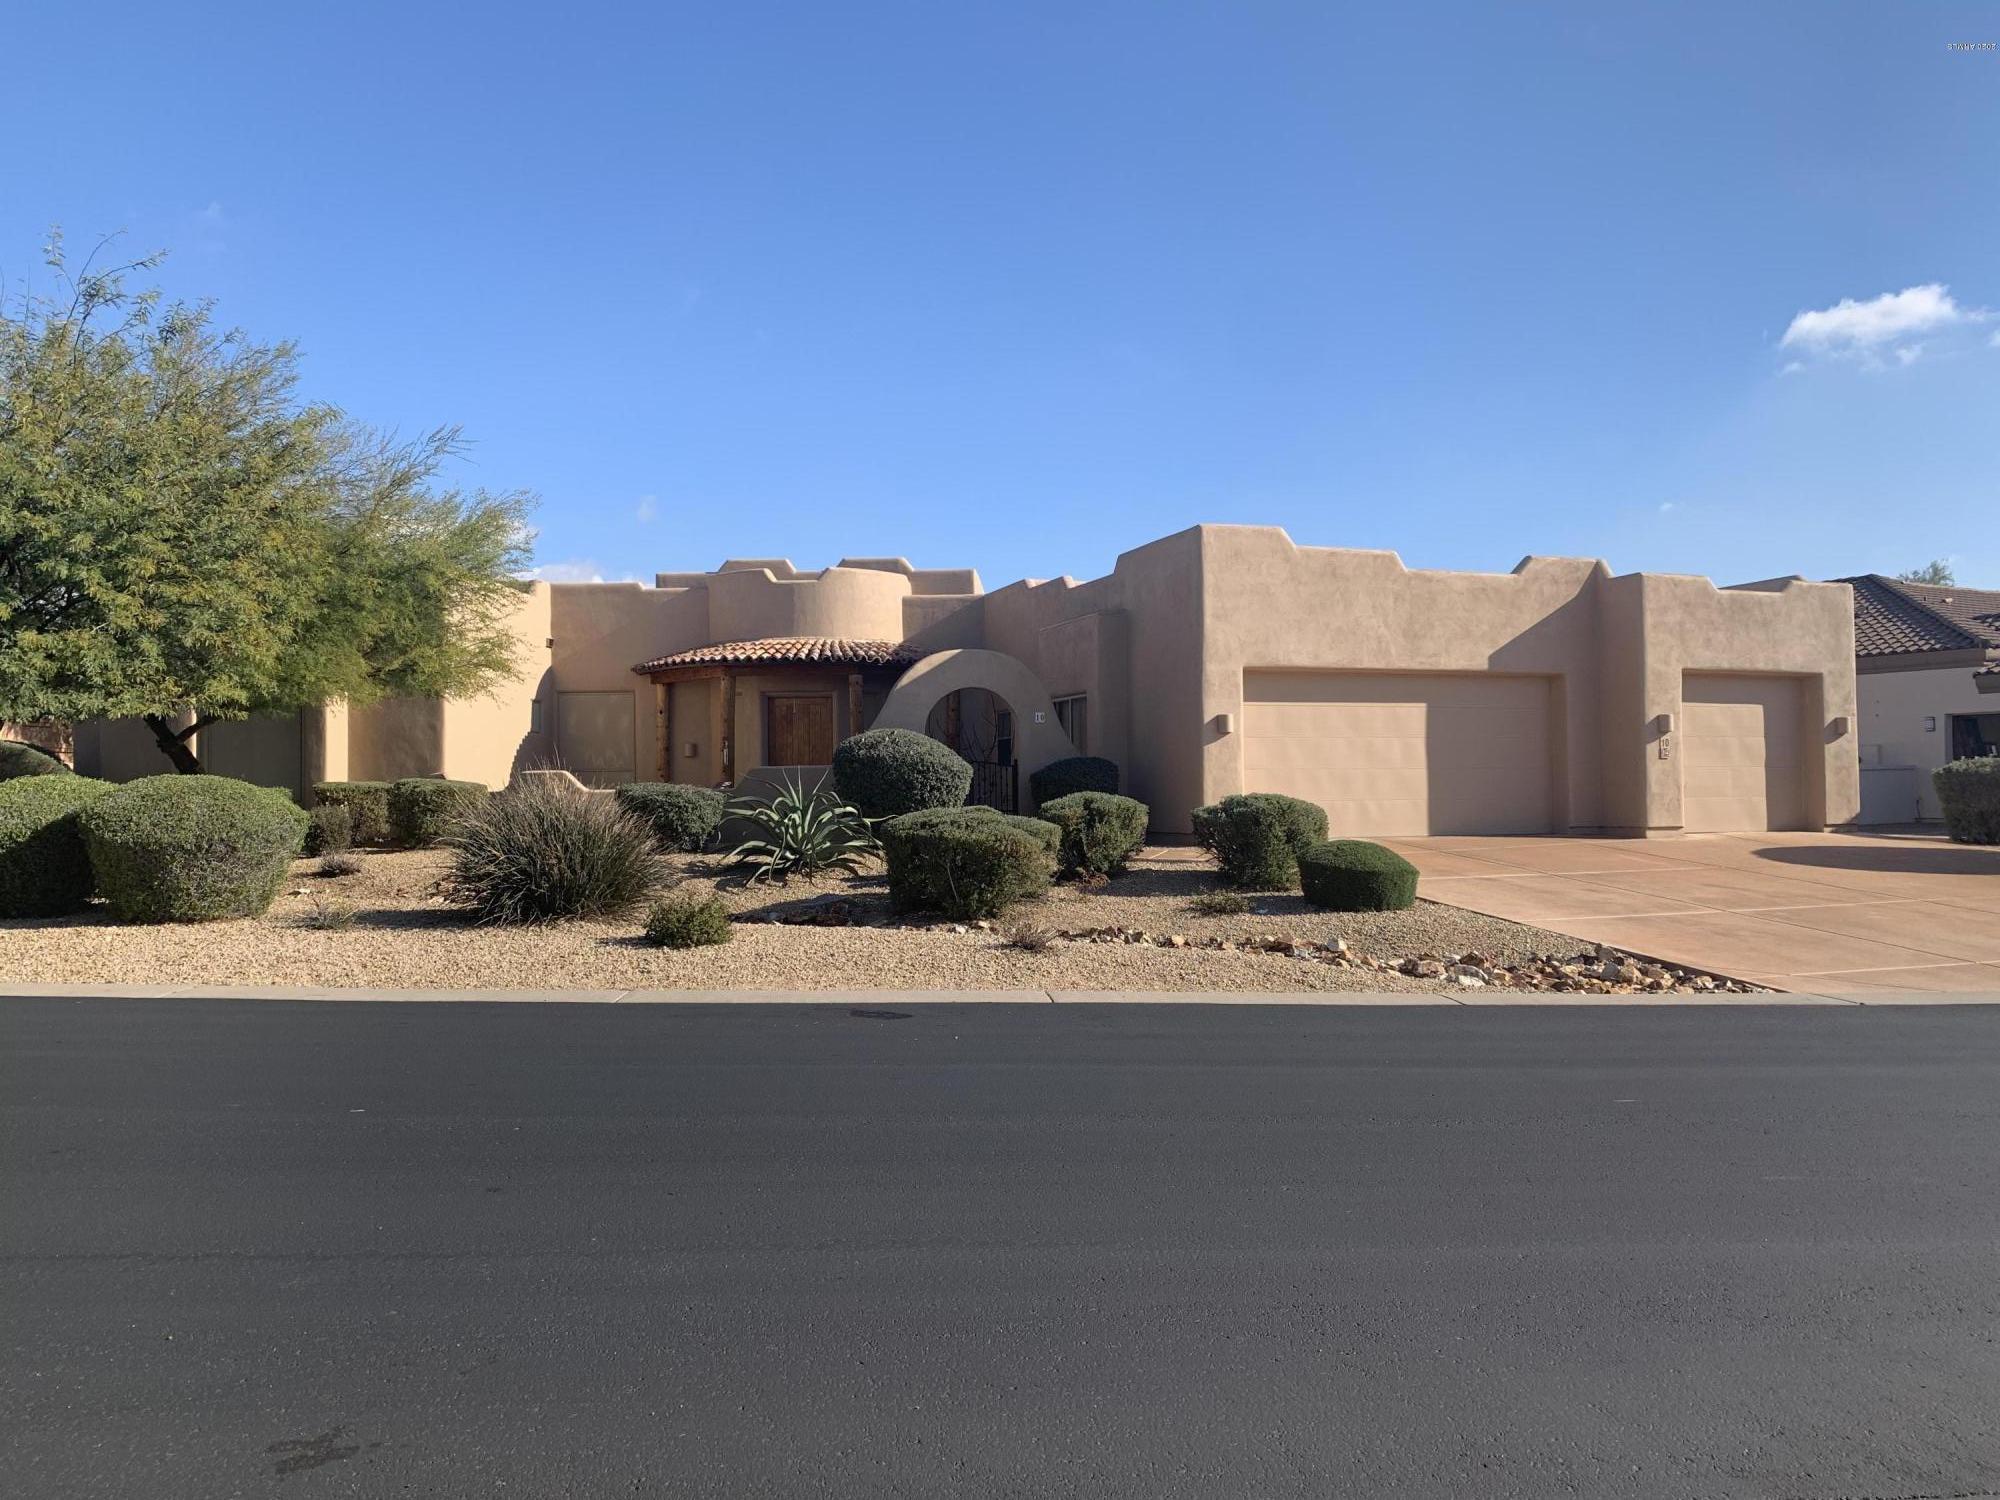 Photo of 7130 E SADDLEBACK Street #10, Mesa, AZ 85207